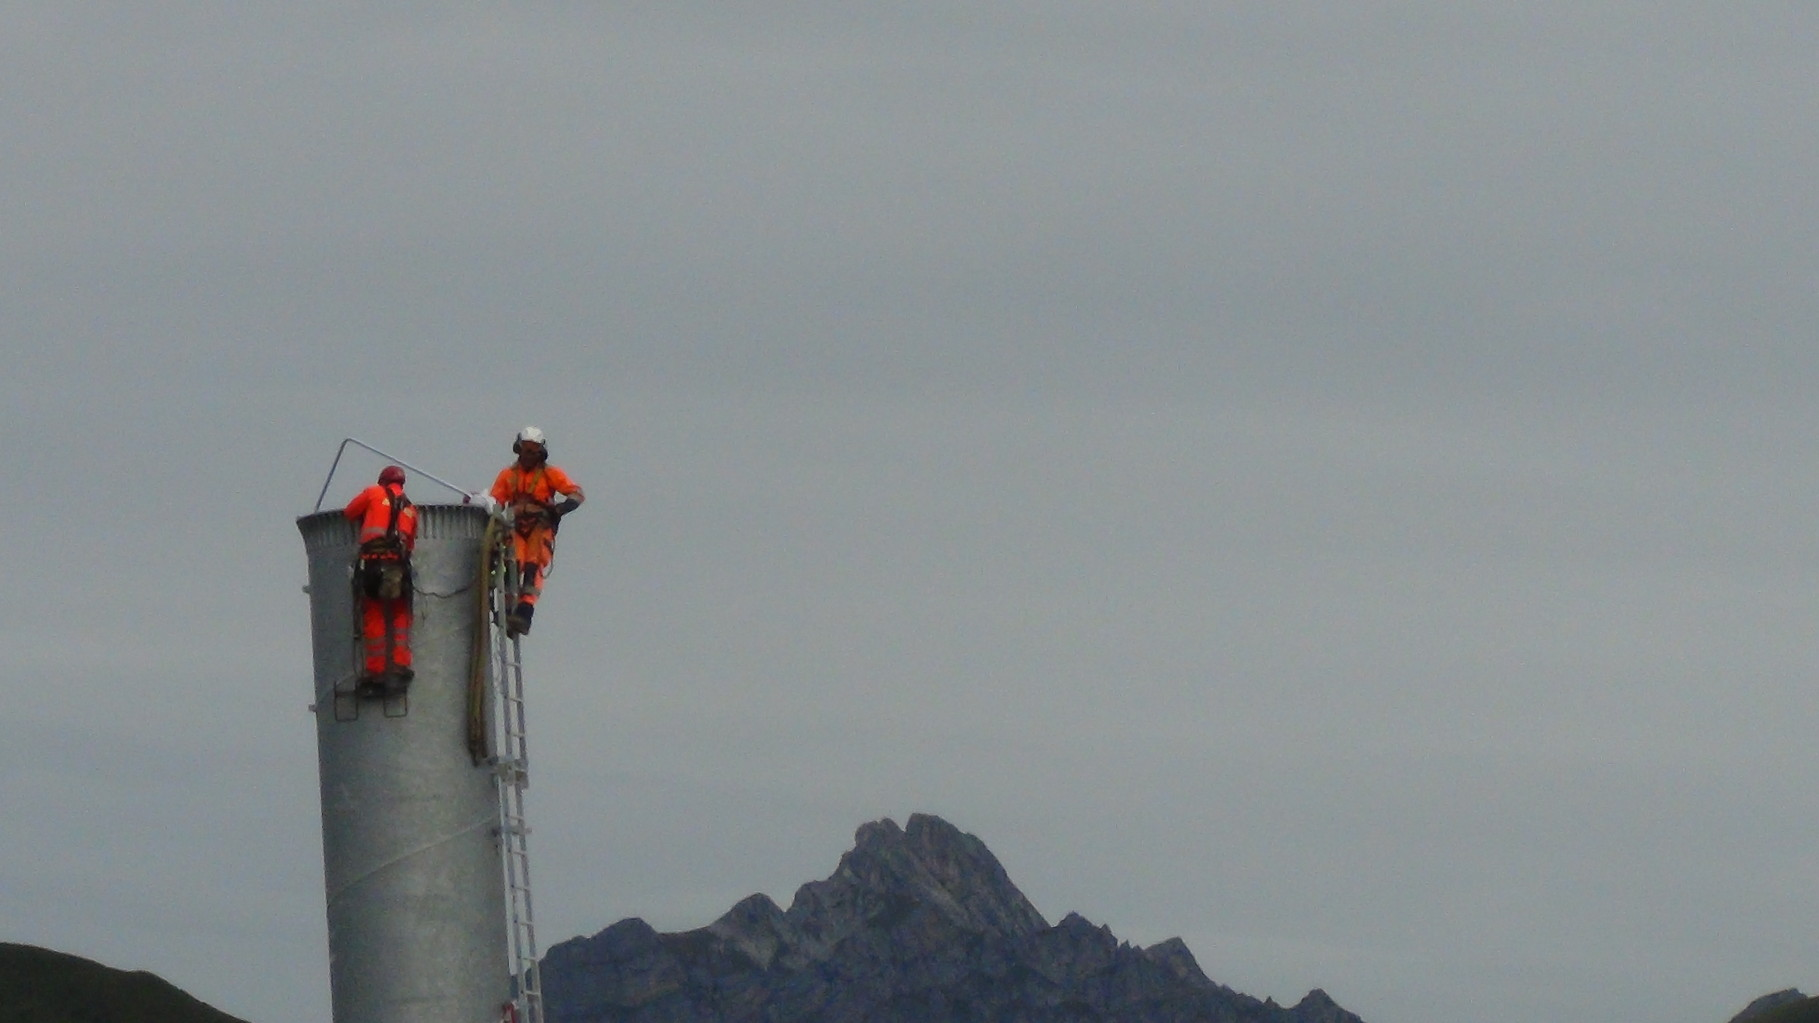 Flugmontage Stütze Seilbahn